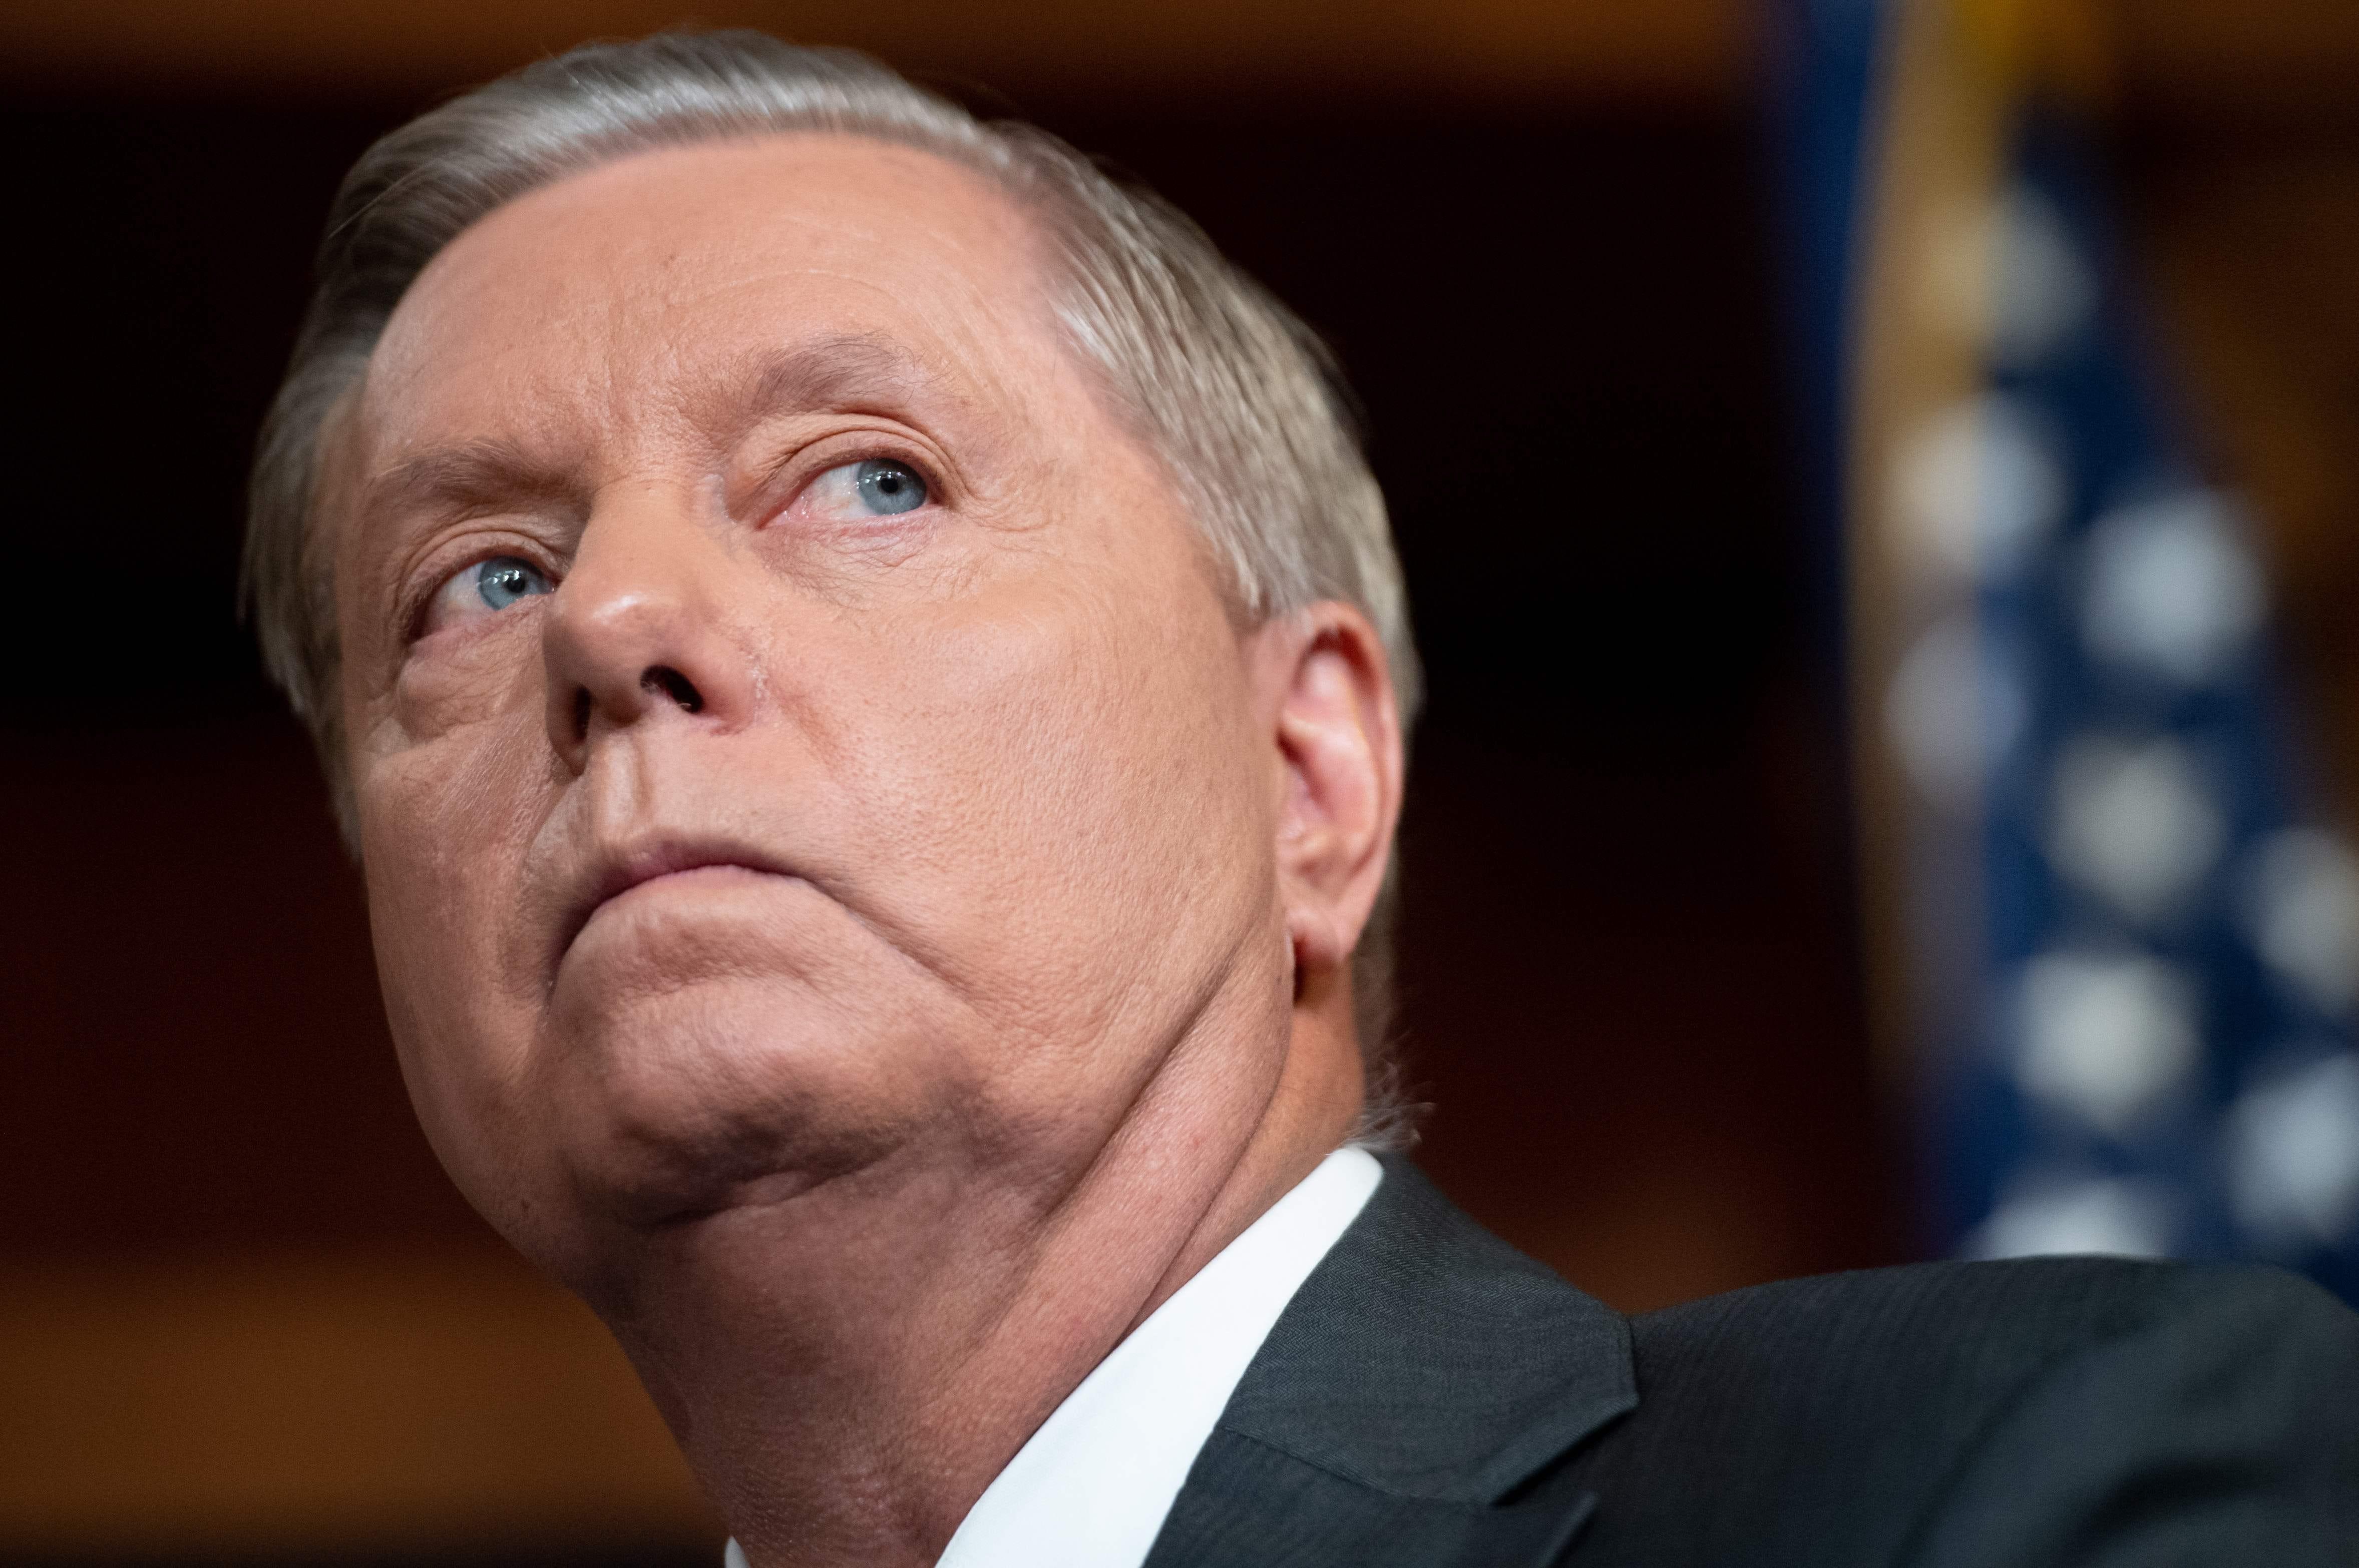 Sen. Lindsey Graham indicates he may support Trump impeachment if inquiry establishes  quid pro quo